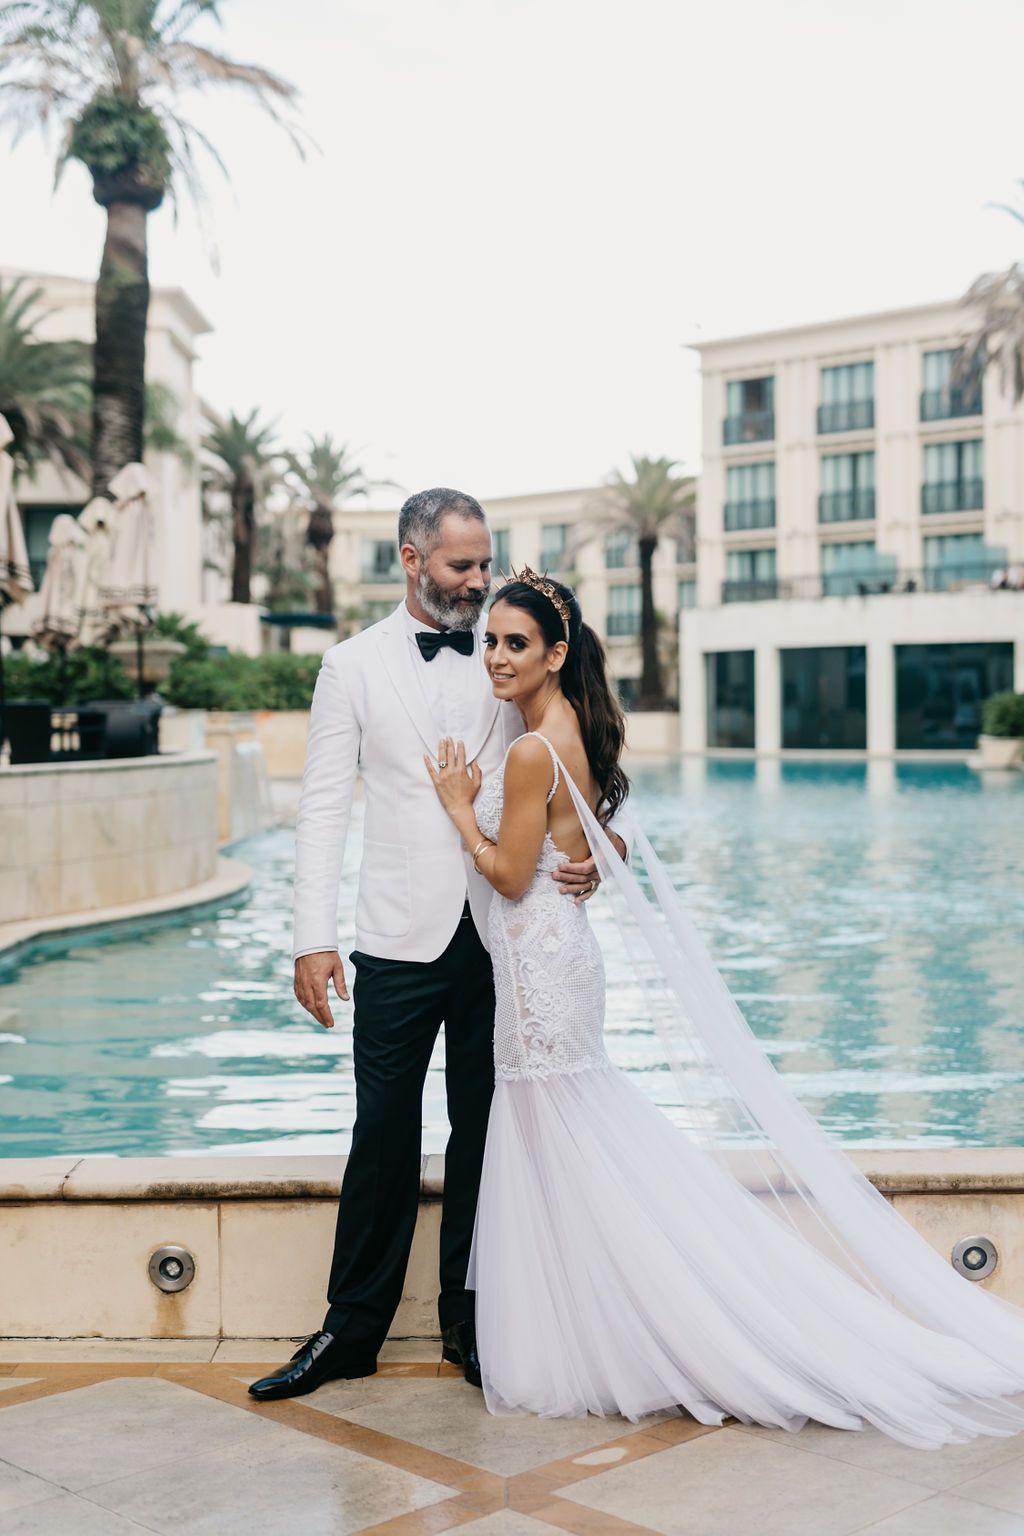 Claudia And Simon S Gorgeous Gold Coast Wedding What We Re